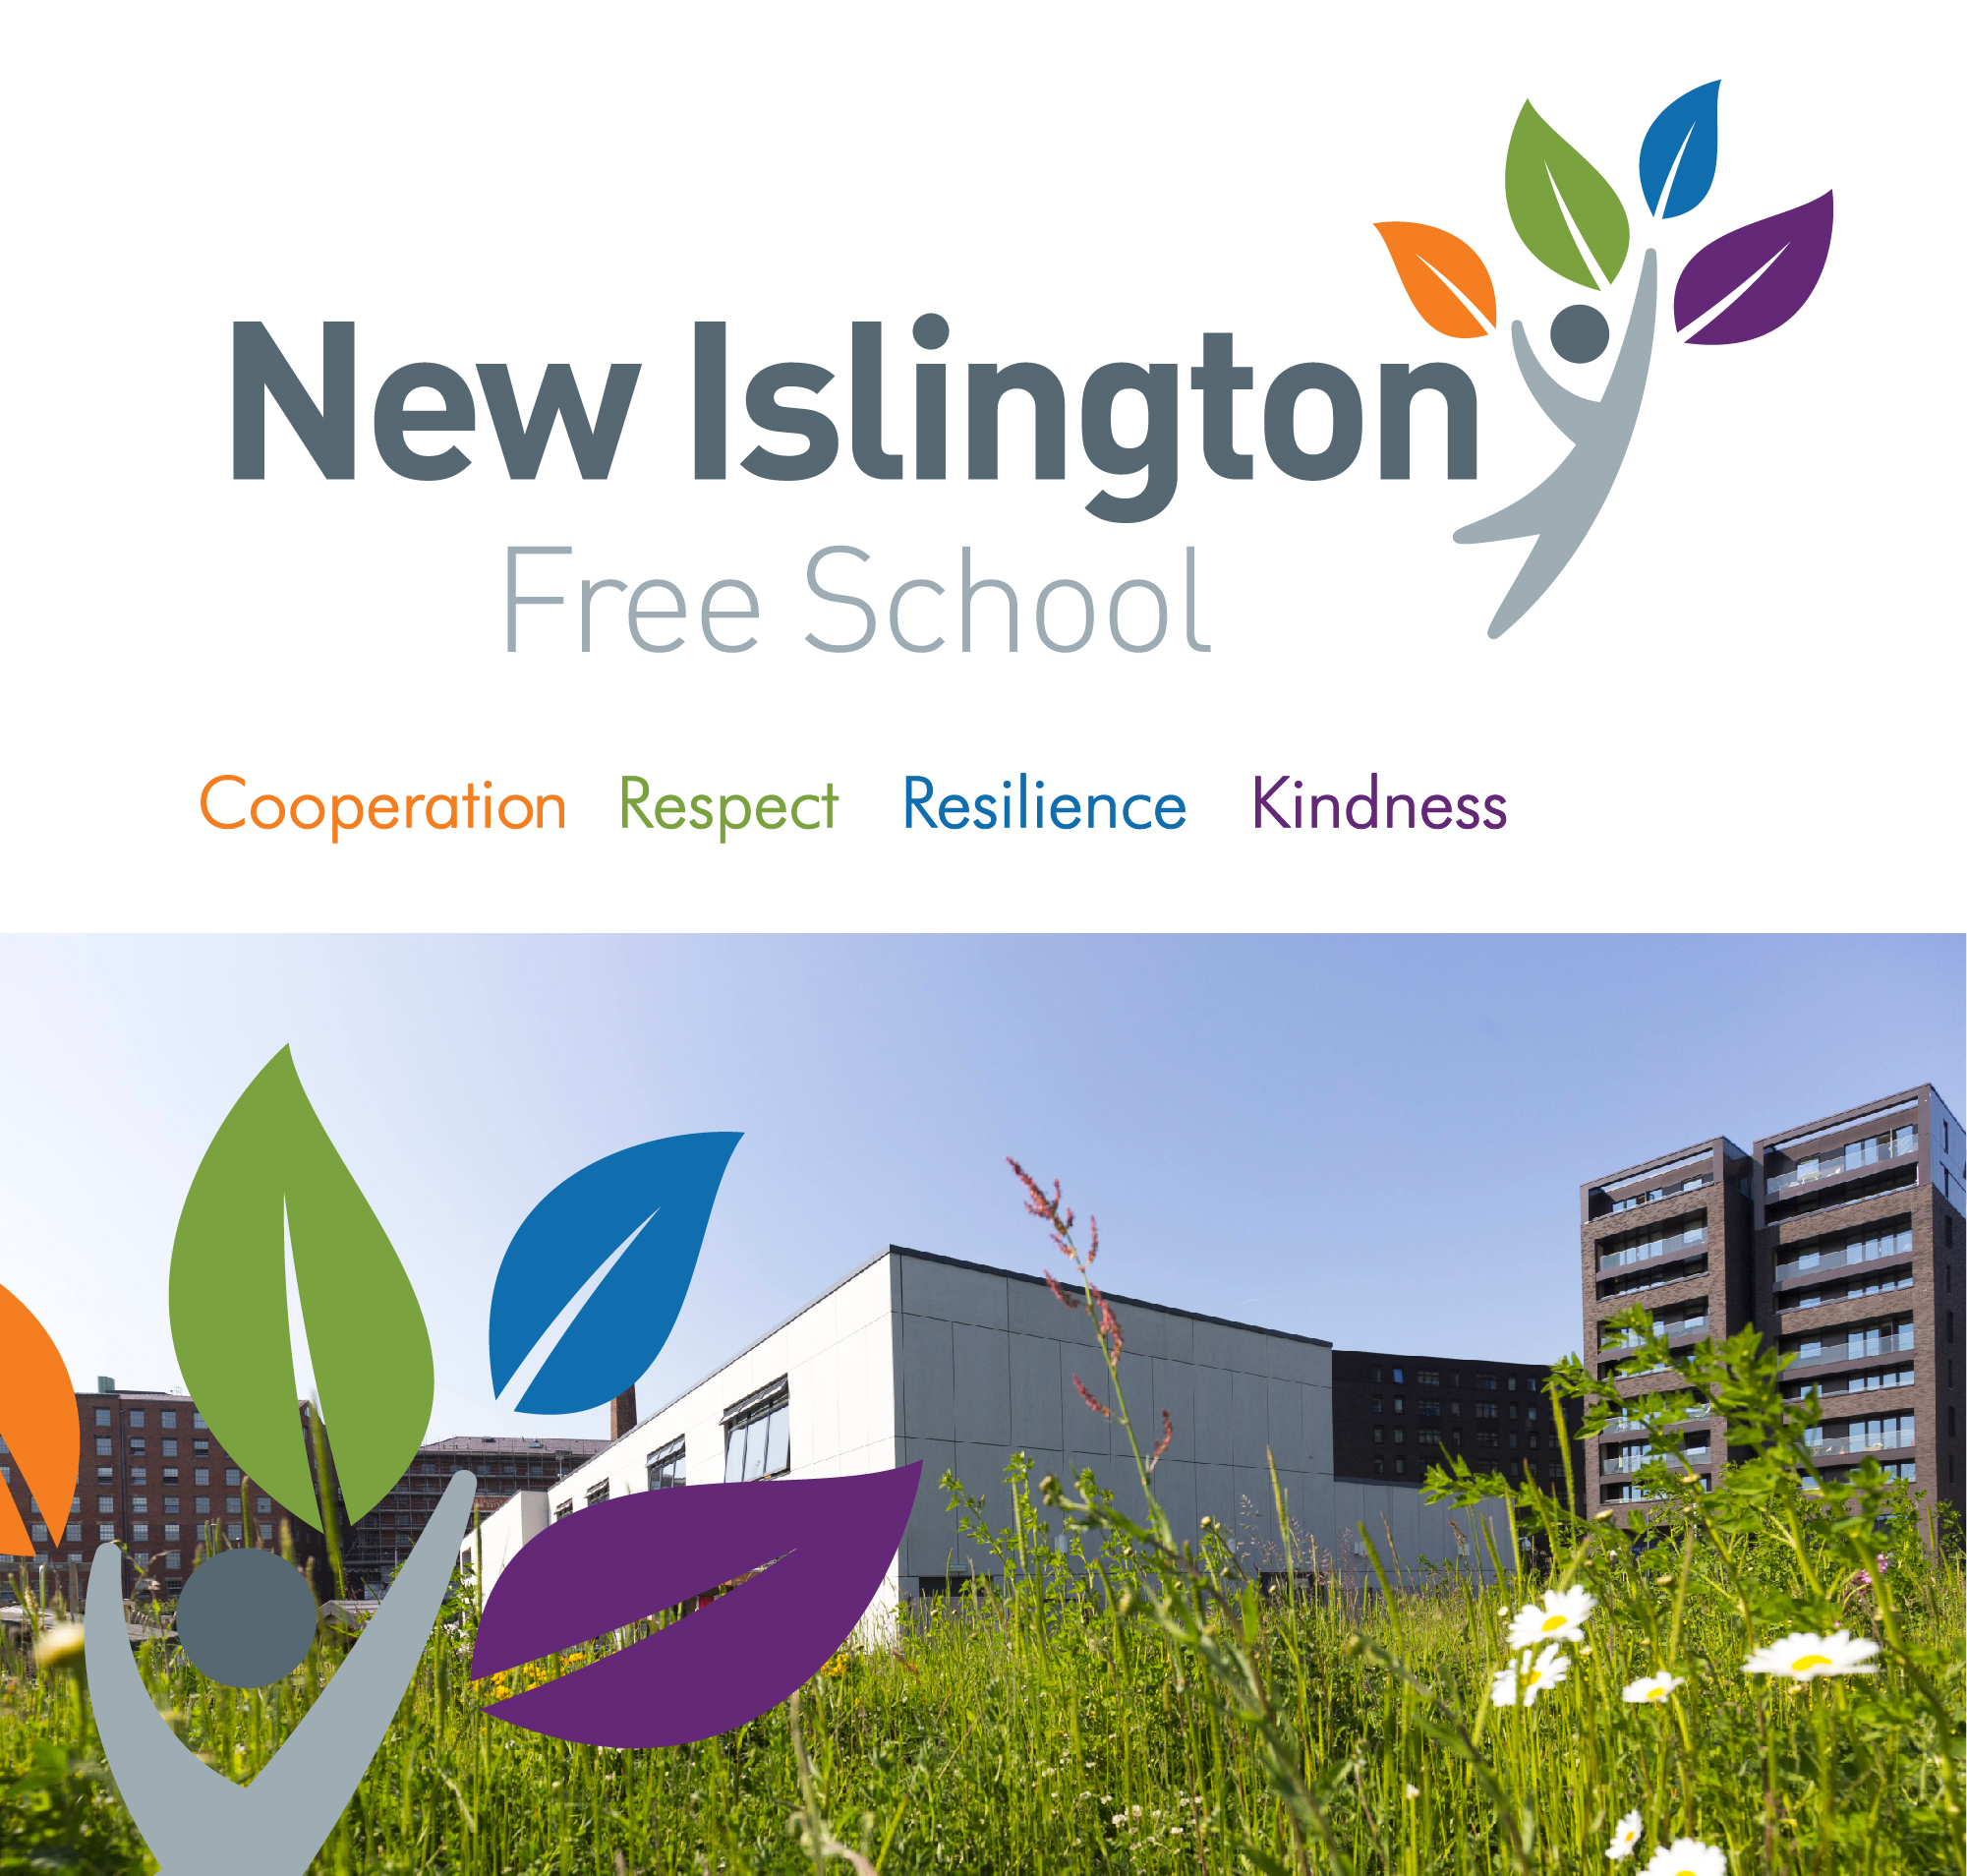 new islington free school brand identity